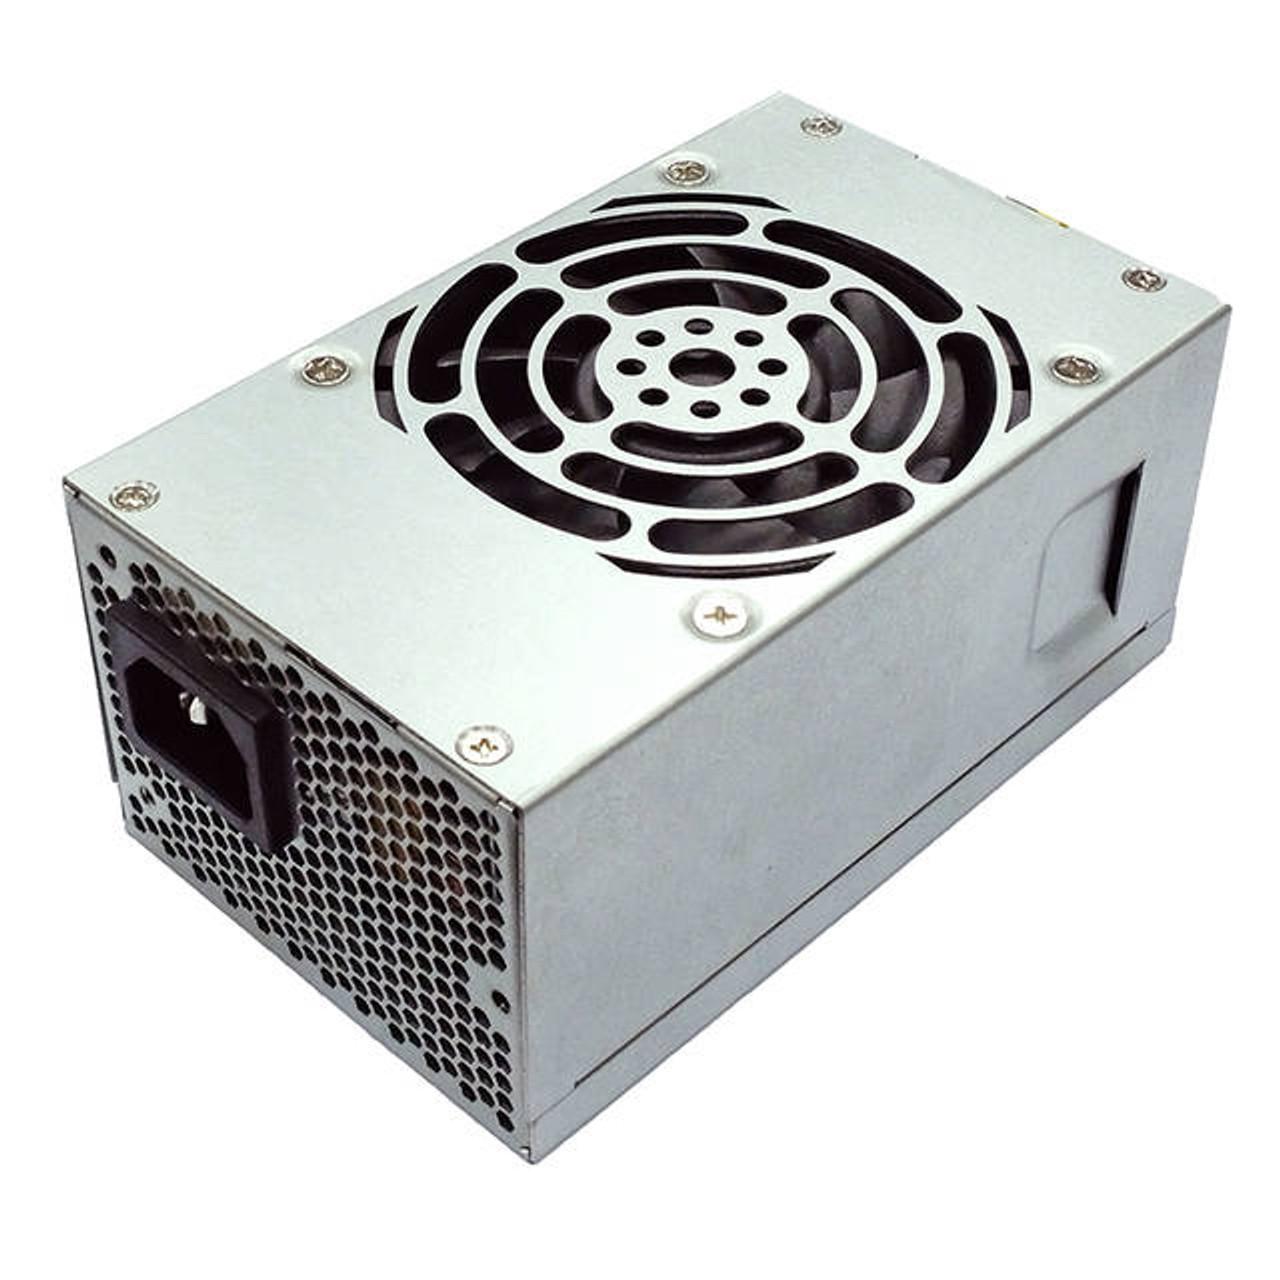 Seasonic SSP-300SUG 300W 80 Plus Gold Flex ATX12V Power Supply W Active PFC